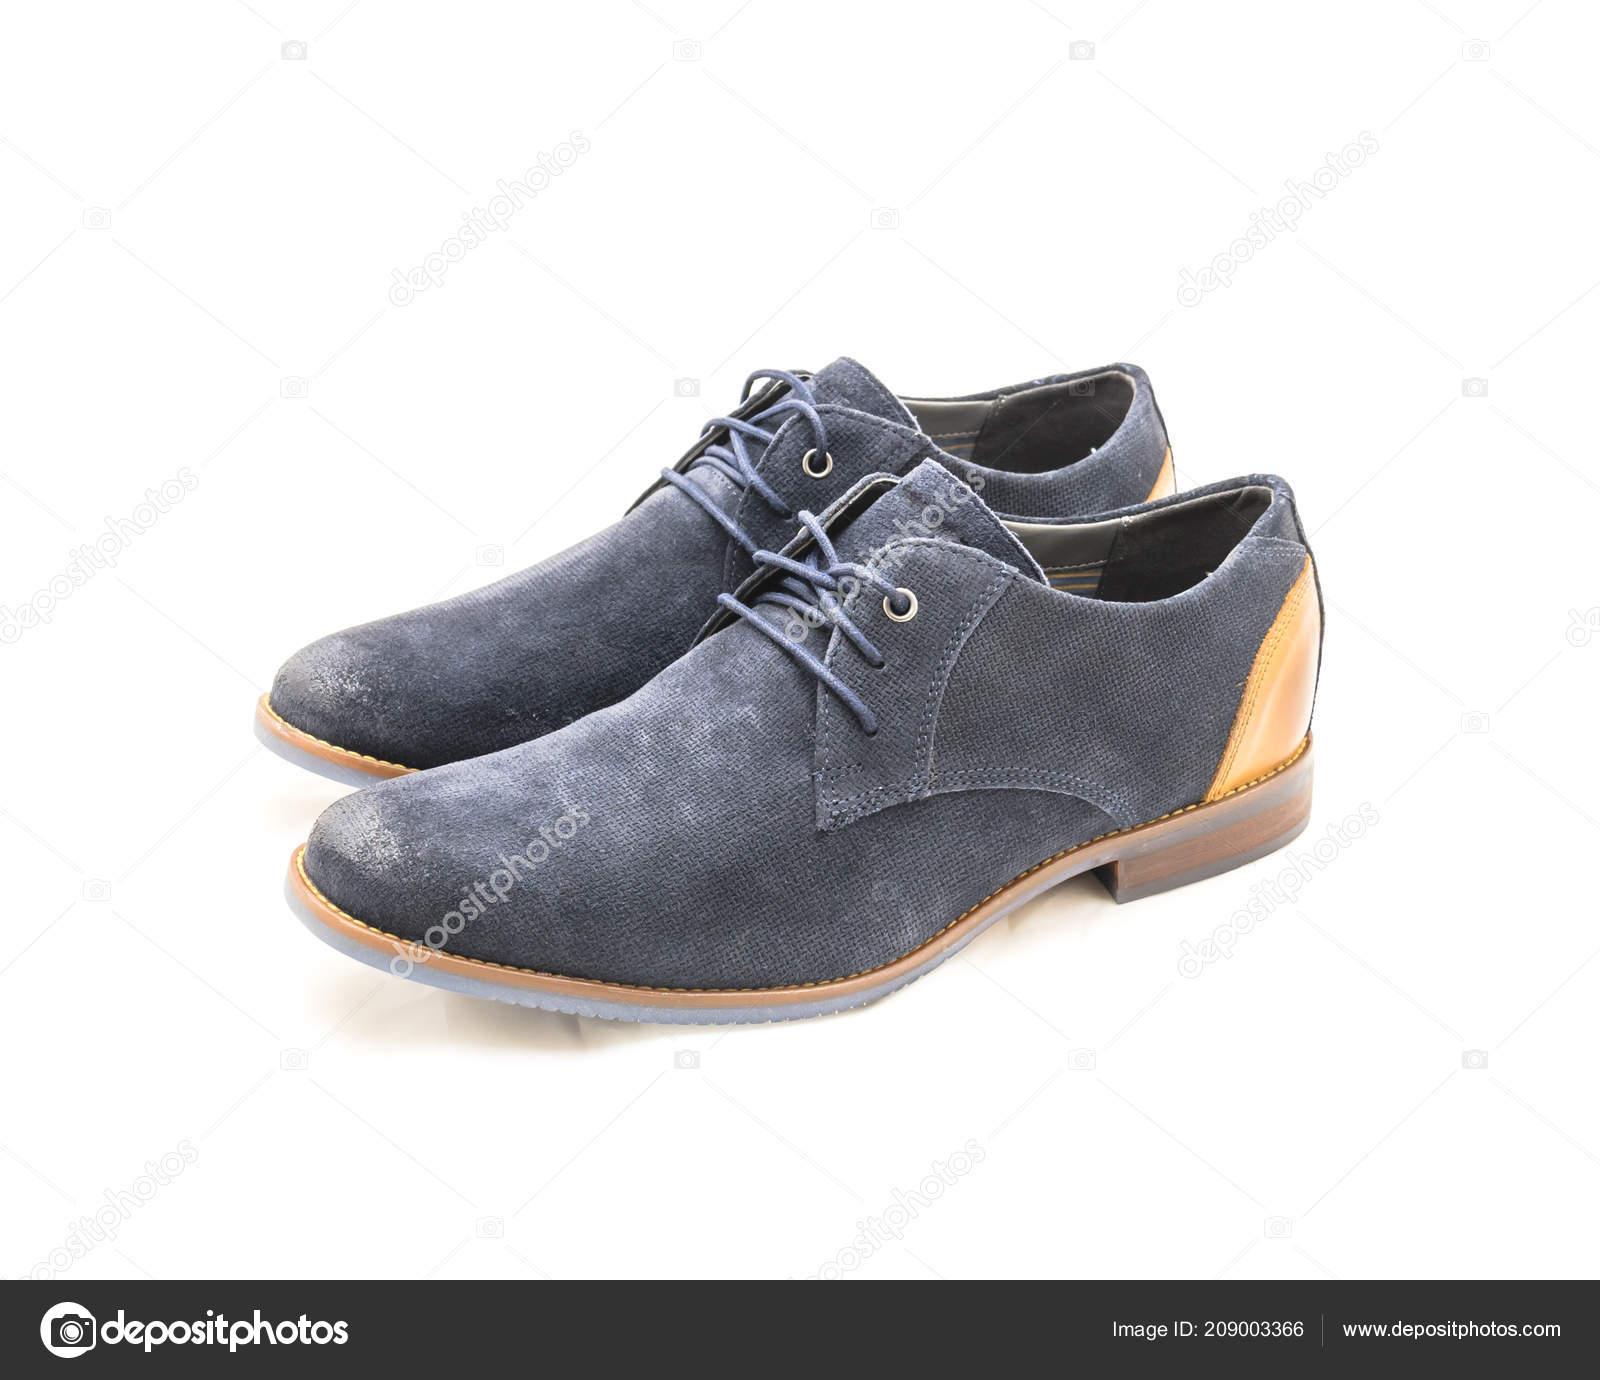 04ce80aa4e Estudio tiro vista superior estrenar un conjunto de pares zapatos blucher  azul oscuro de los hombres aislados en fondo blanco. Código de vestir  formal para ...